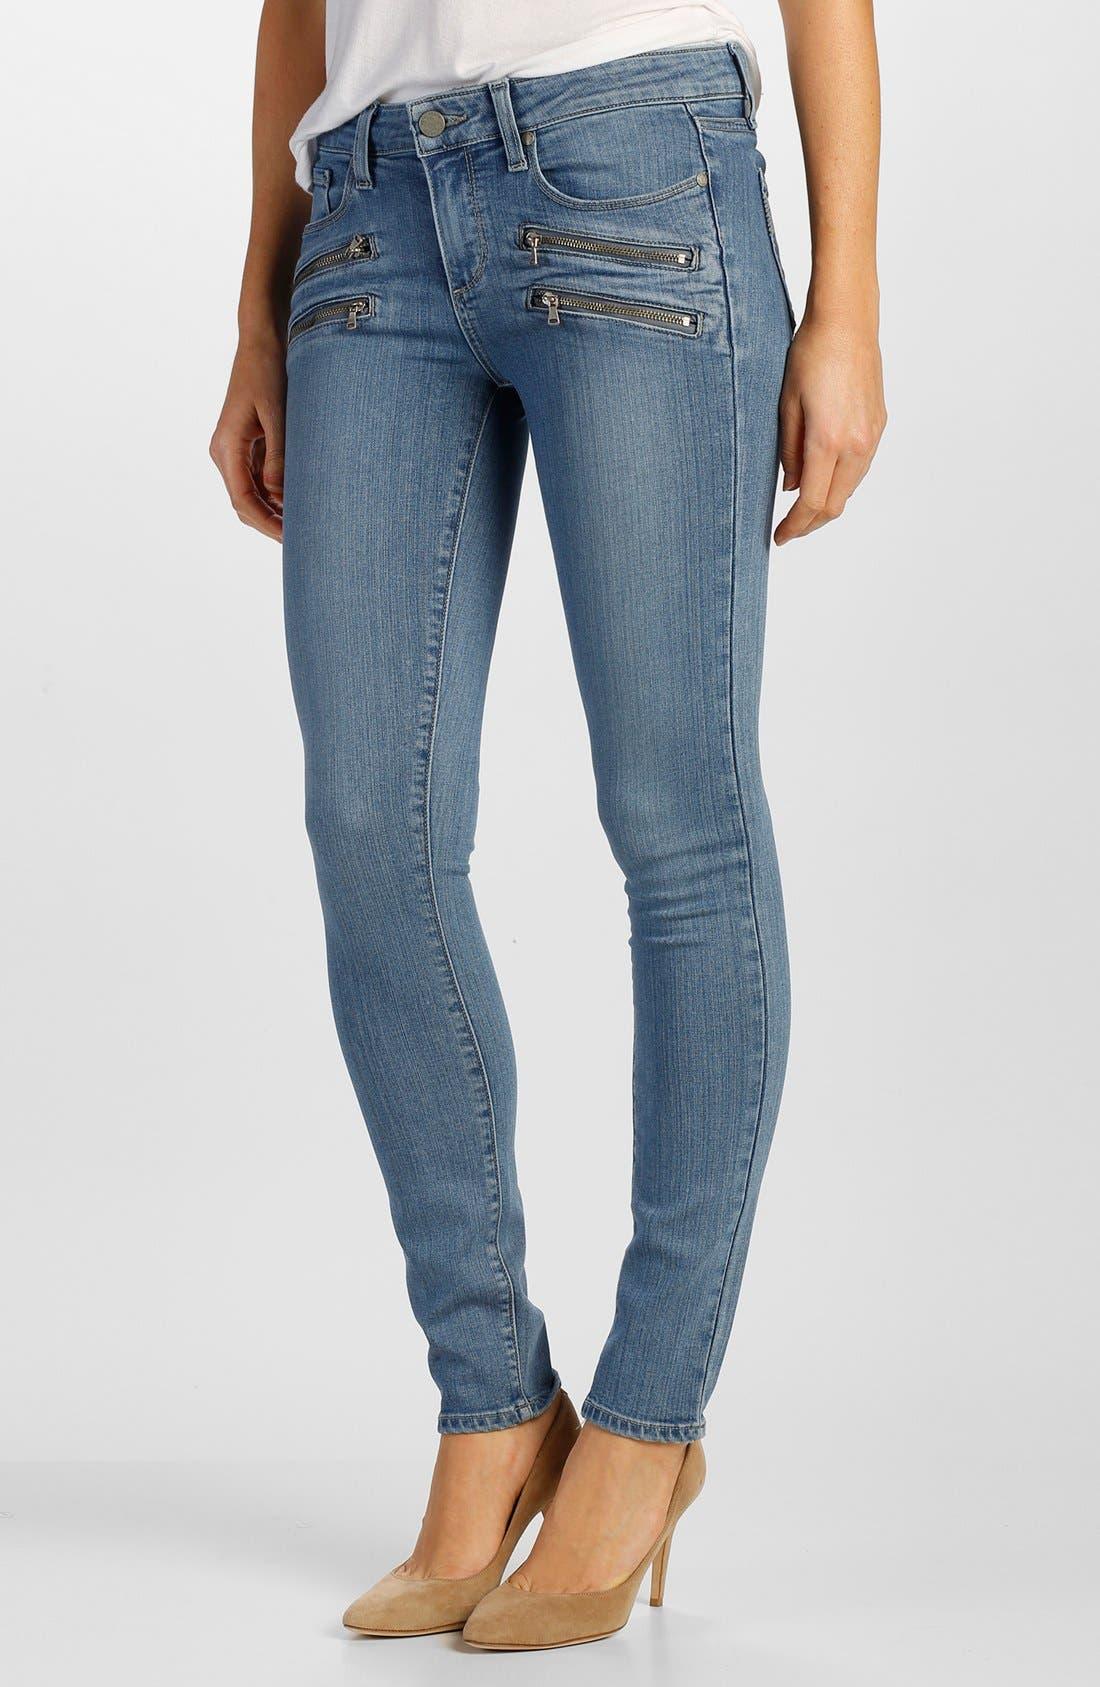 Alternate Image 1 Selected - Paige Denim 'Transcend - Edgemont' Ultra Skinny Jeans (Joelle No Whiskers)